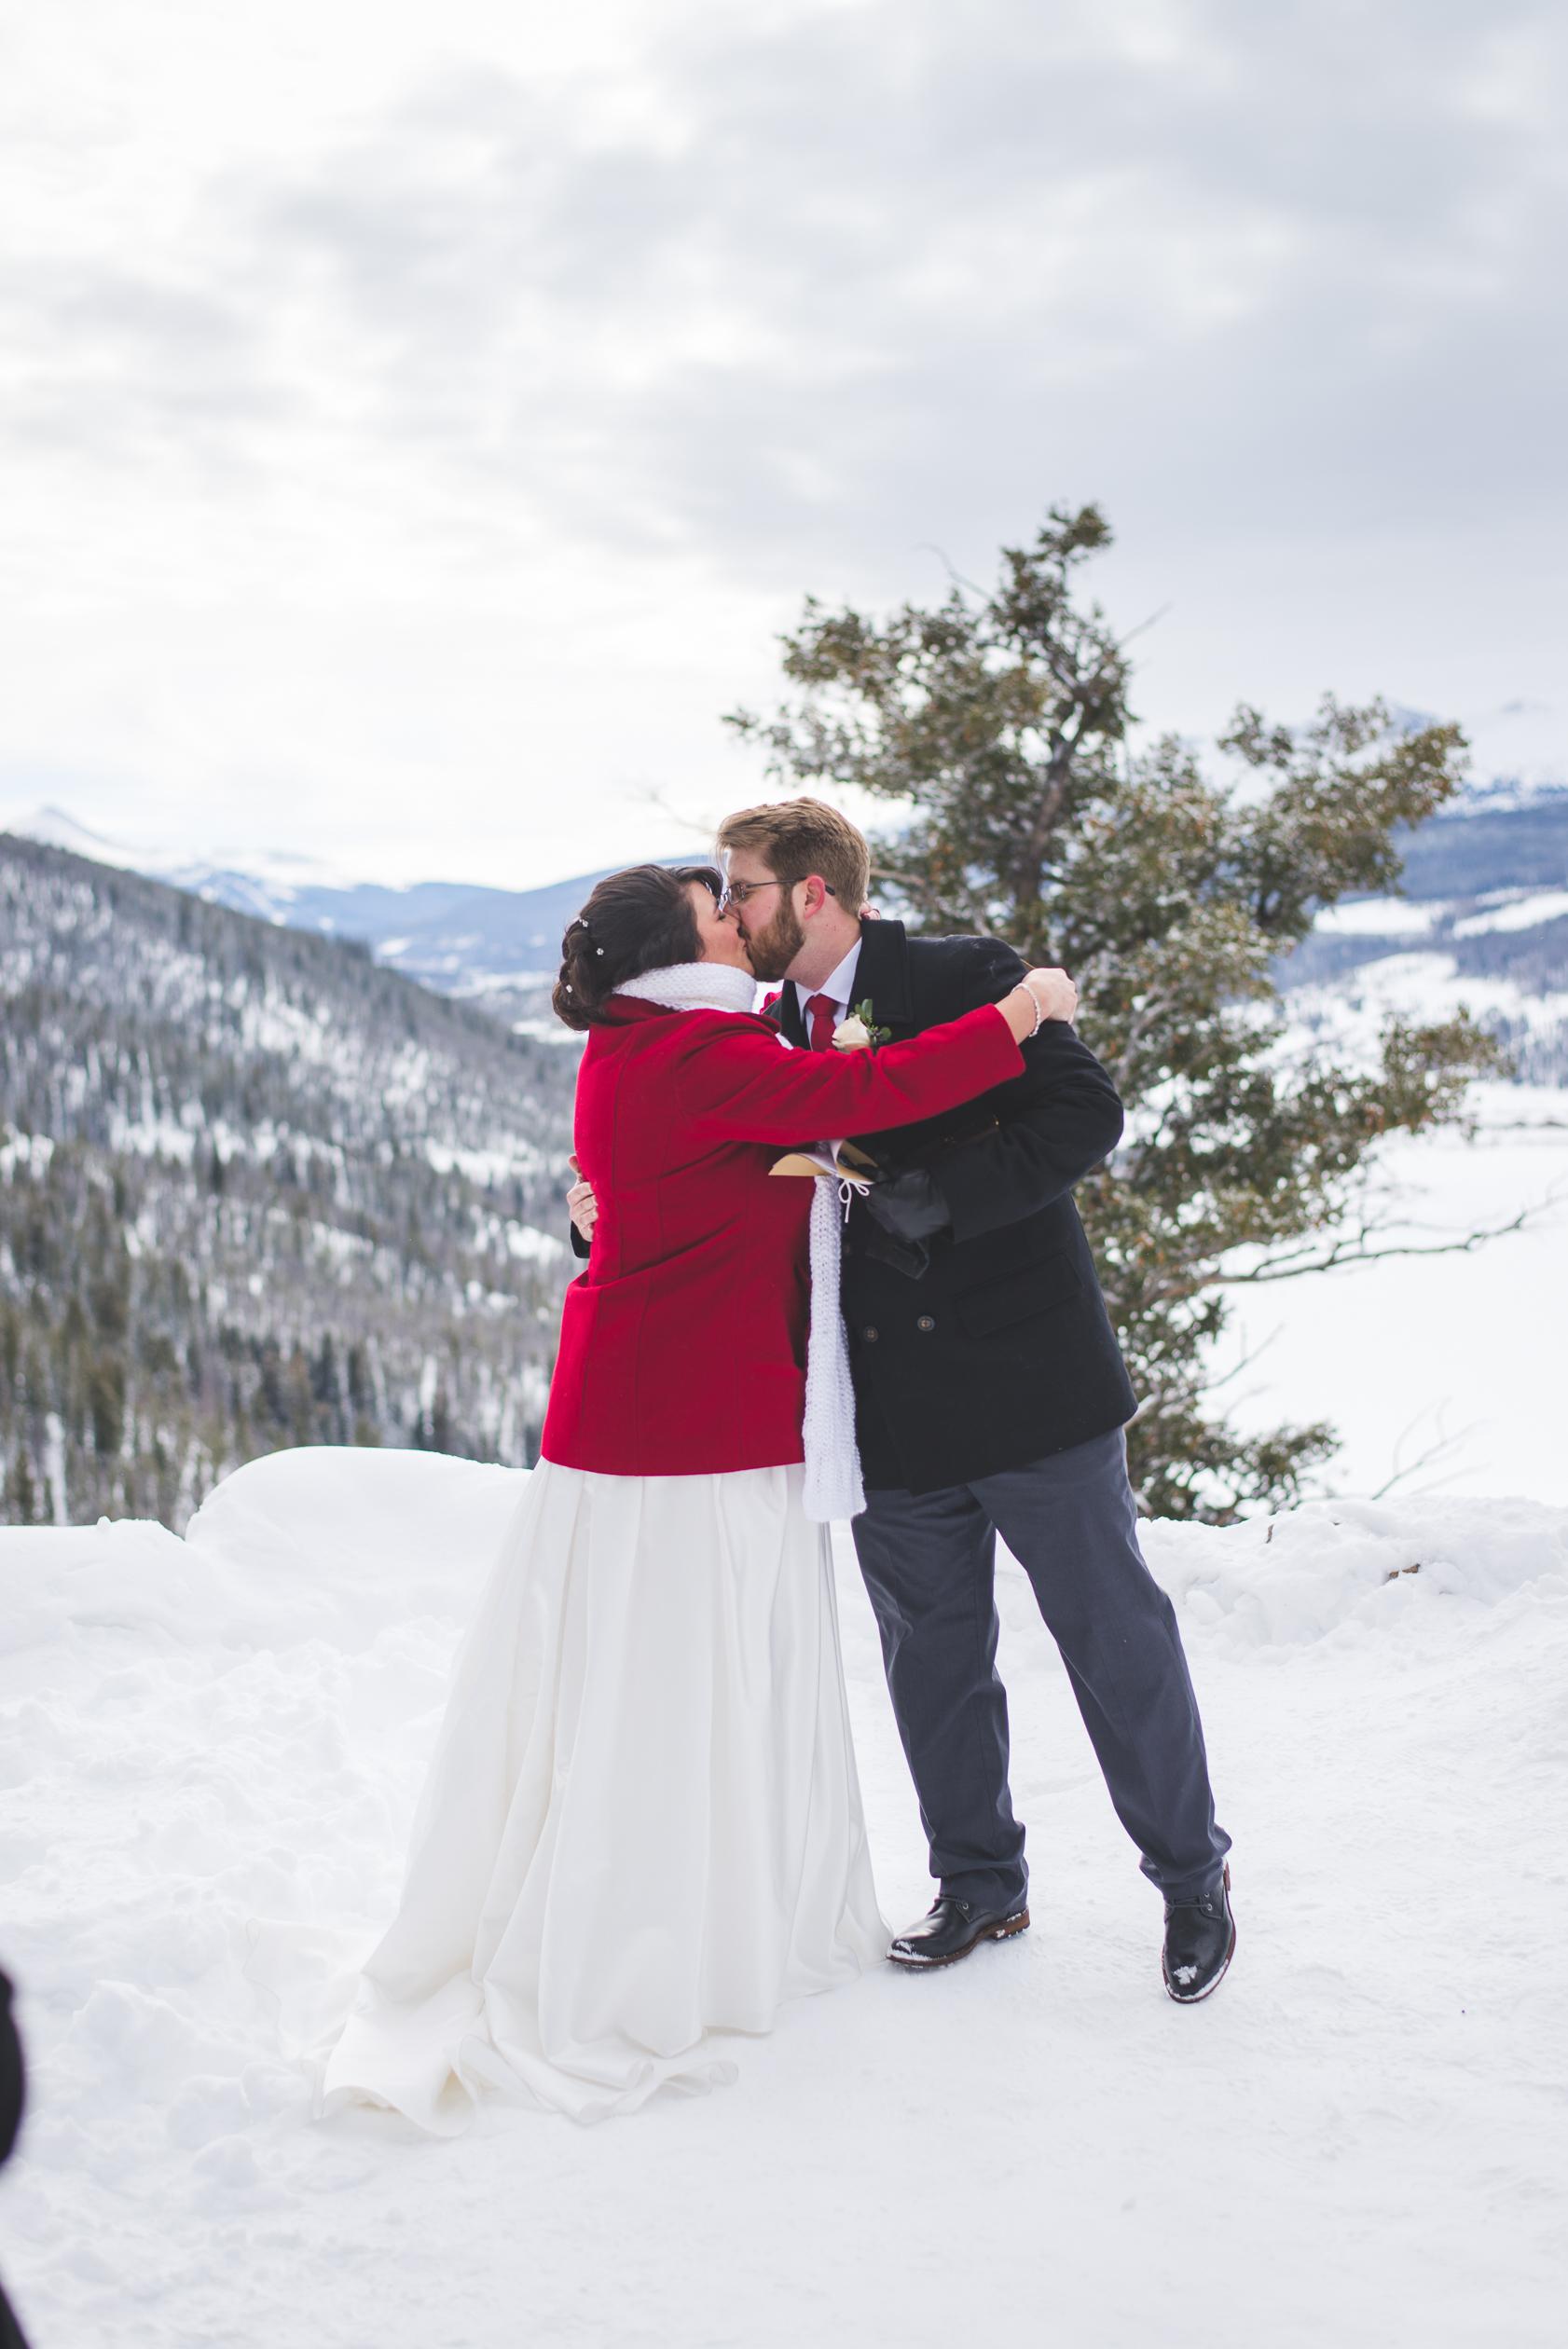 beautiful Colorado destination elopement in the mountains during winter, near Breckenridge, Colorado